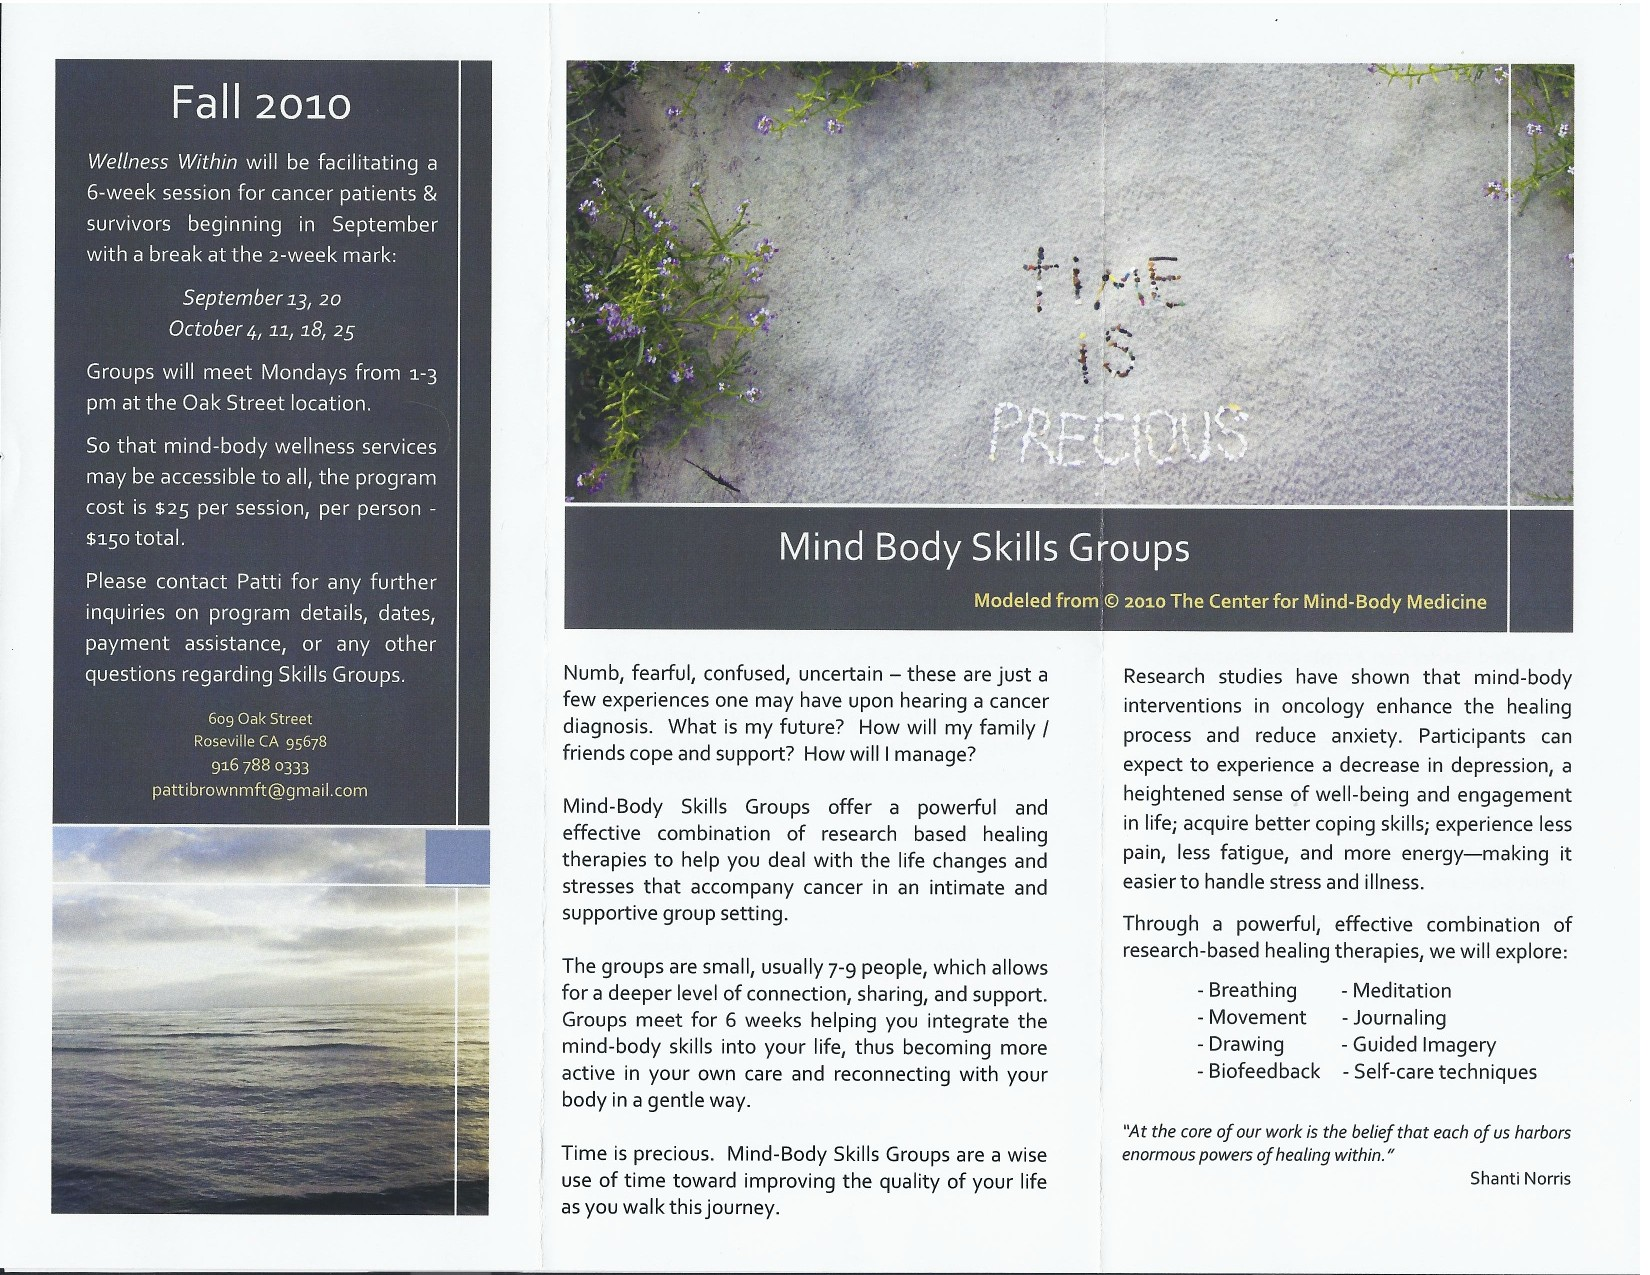 brochure-2-e1441502045476.jpg